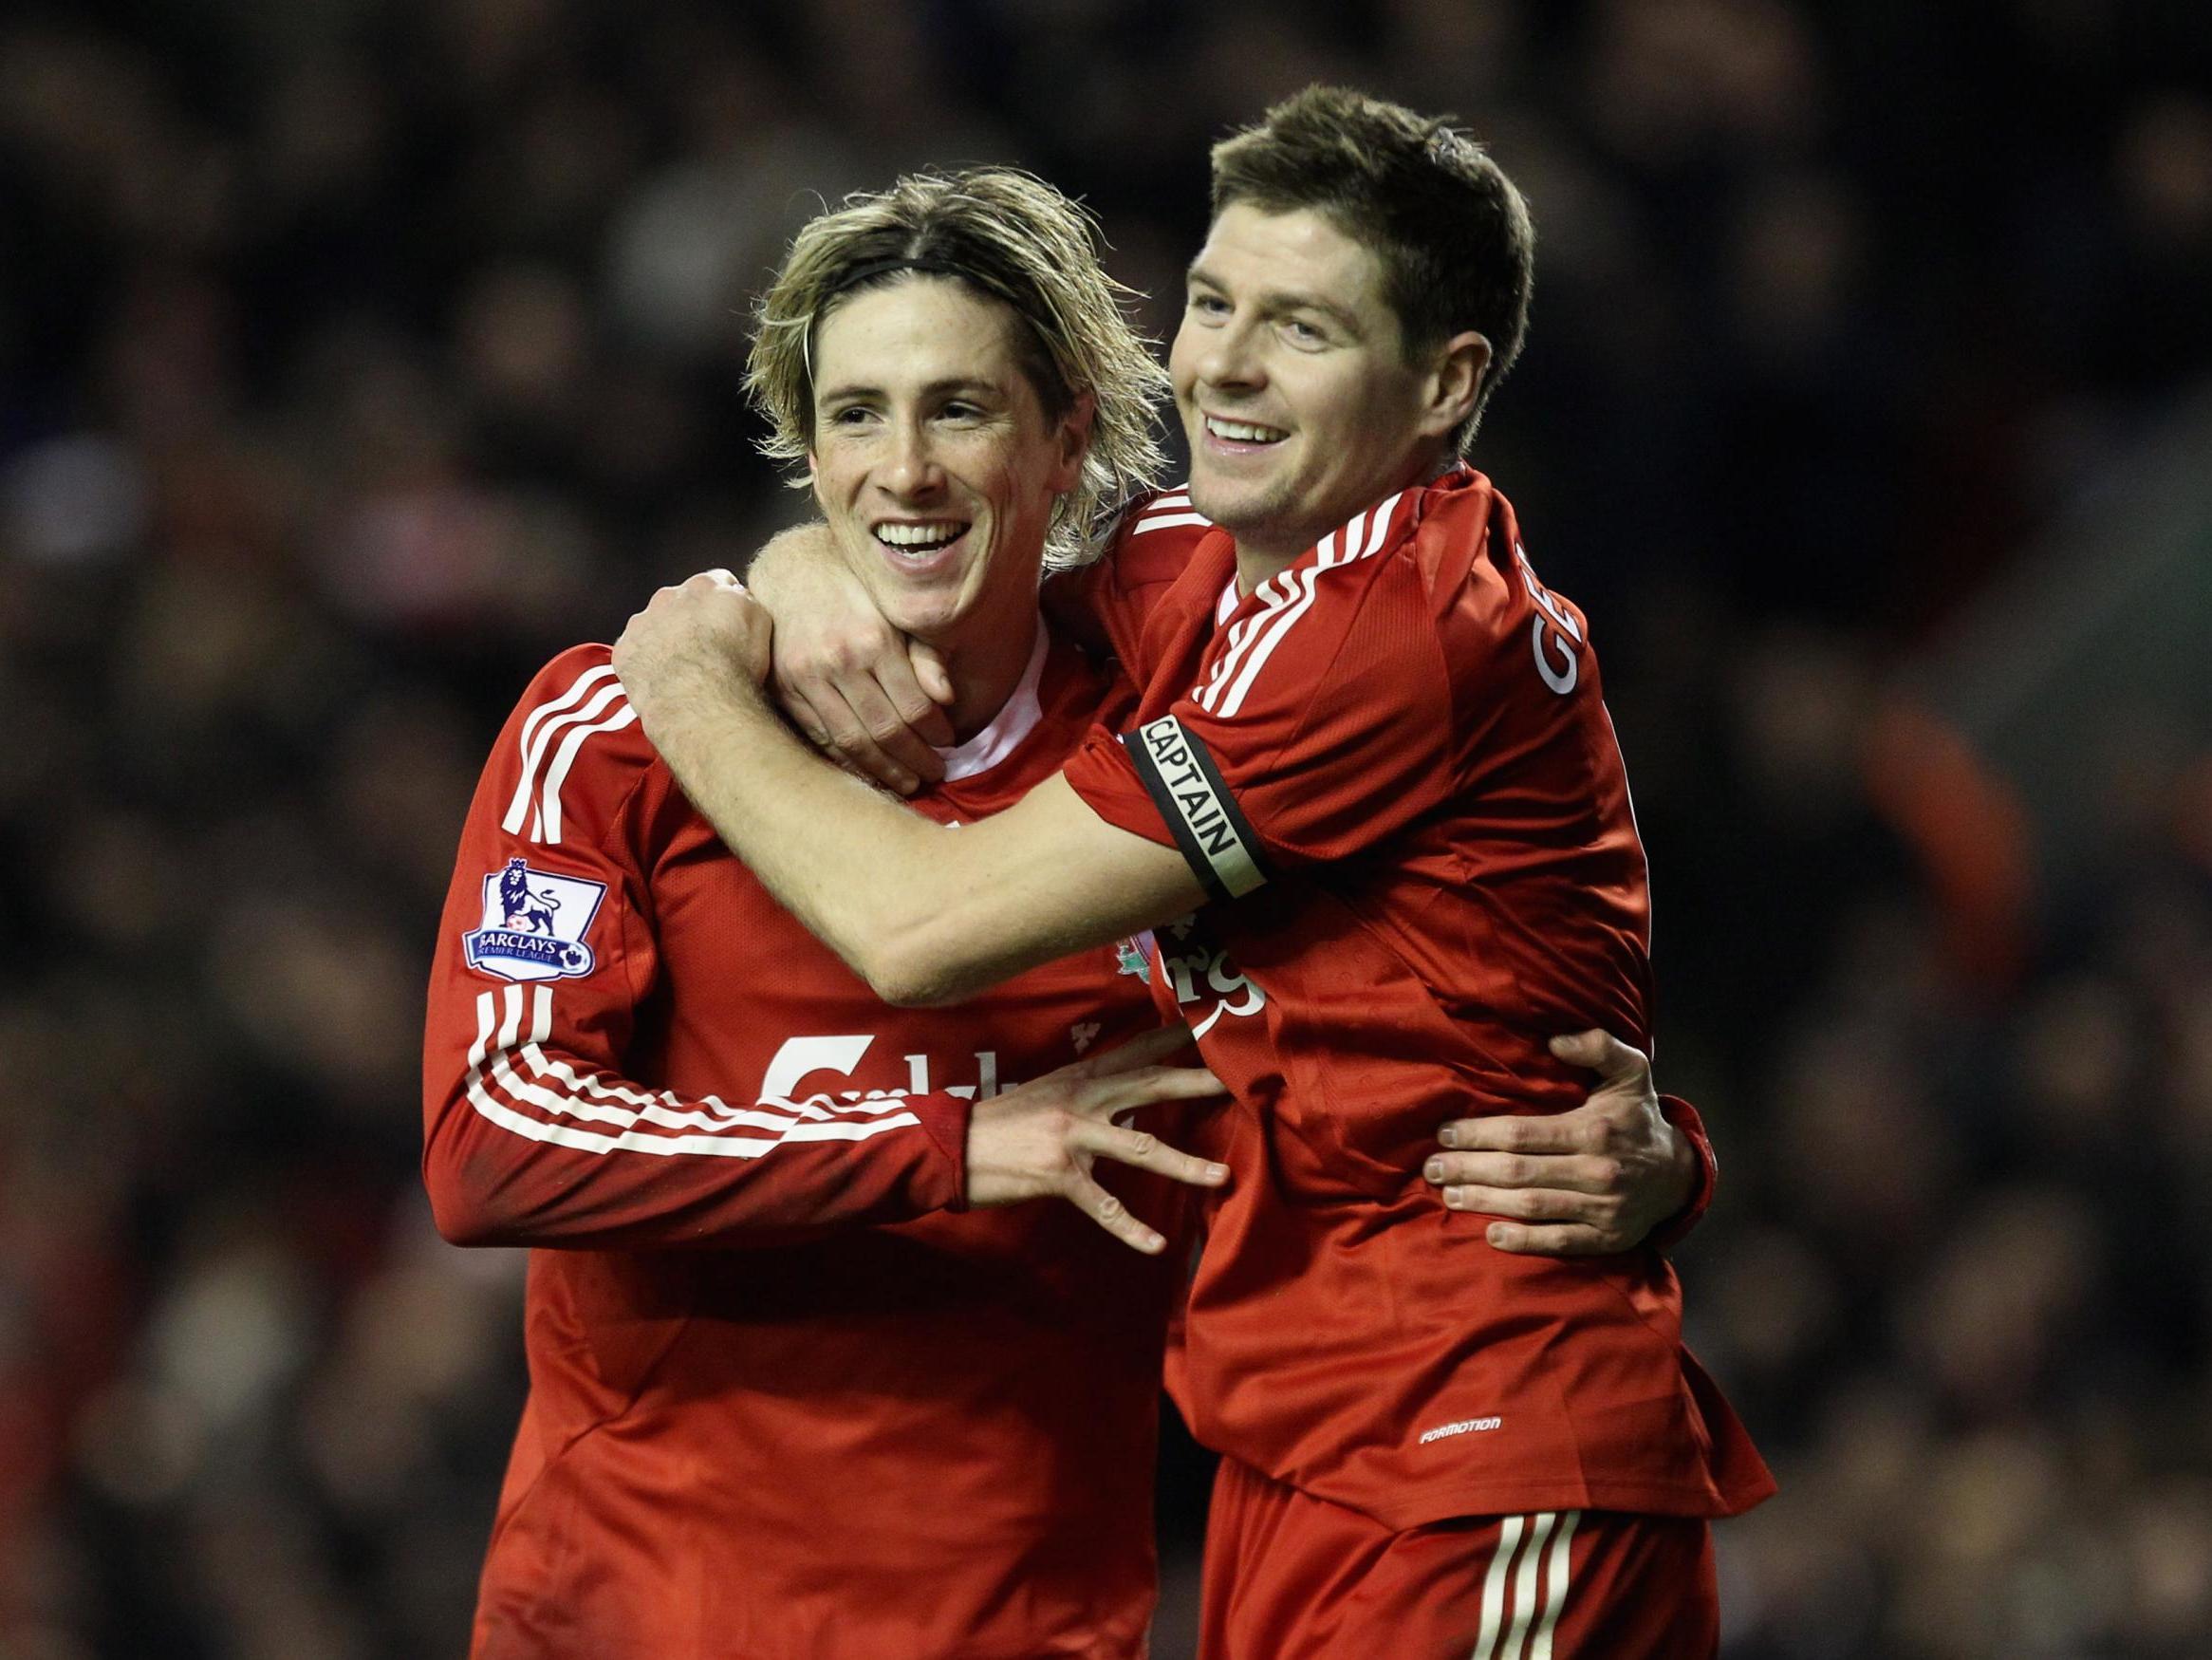 Fernando Torres: Former Liverpool striker singles out Steven Gerrard for special praise after announcing retirement